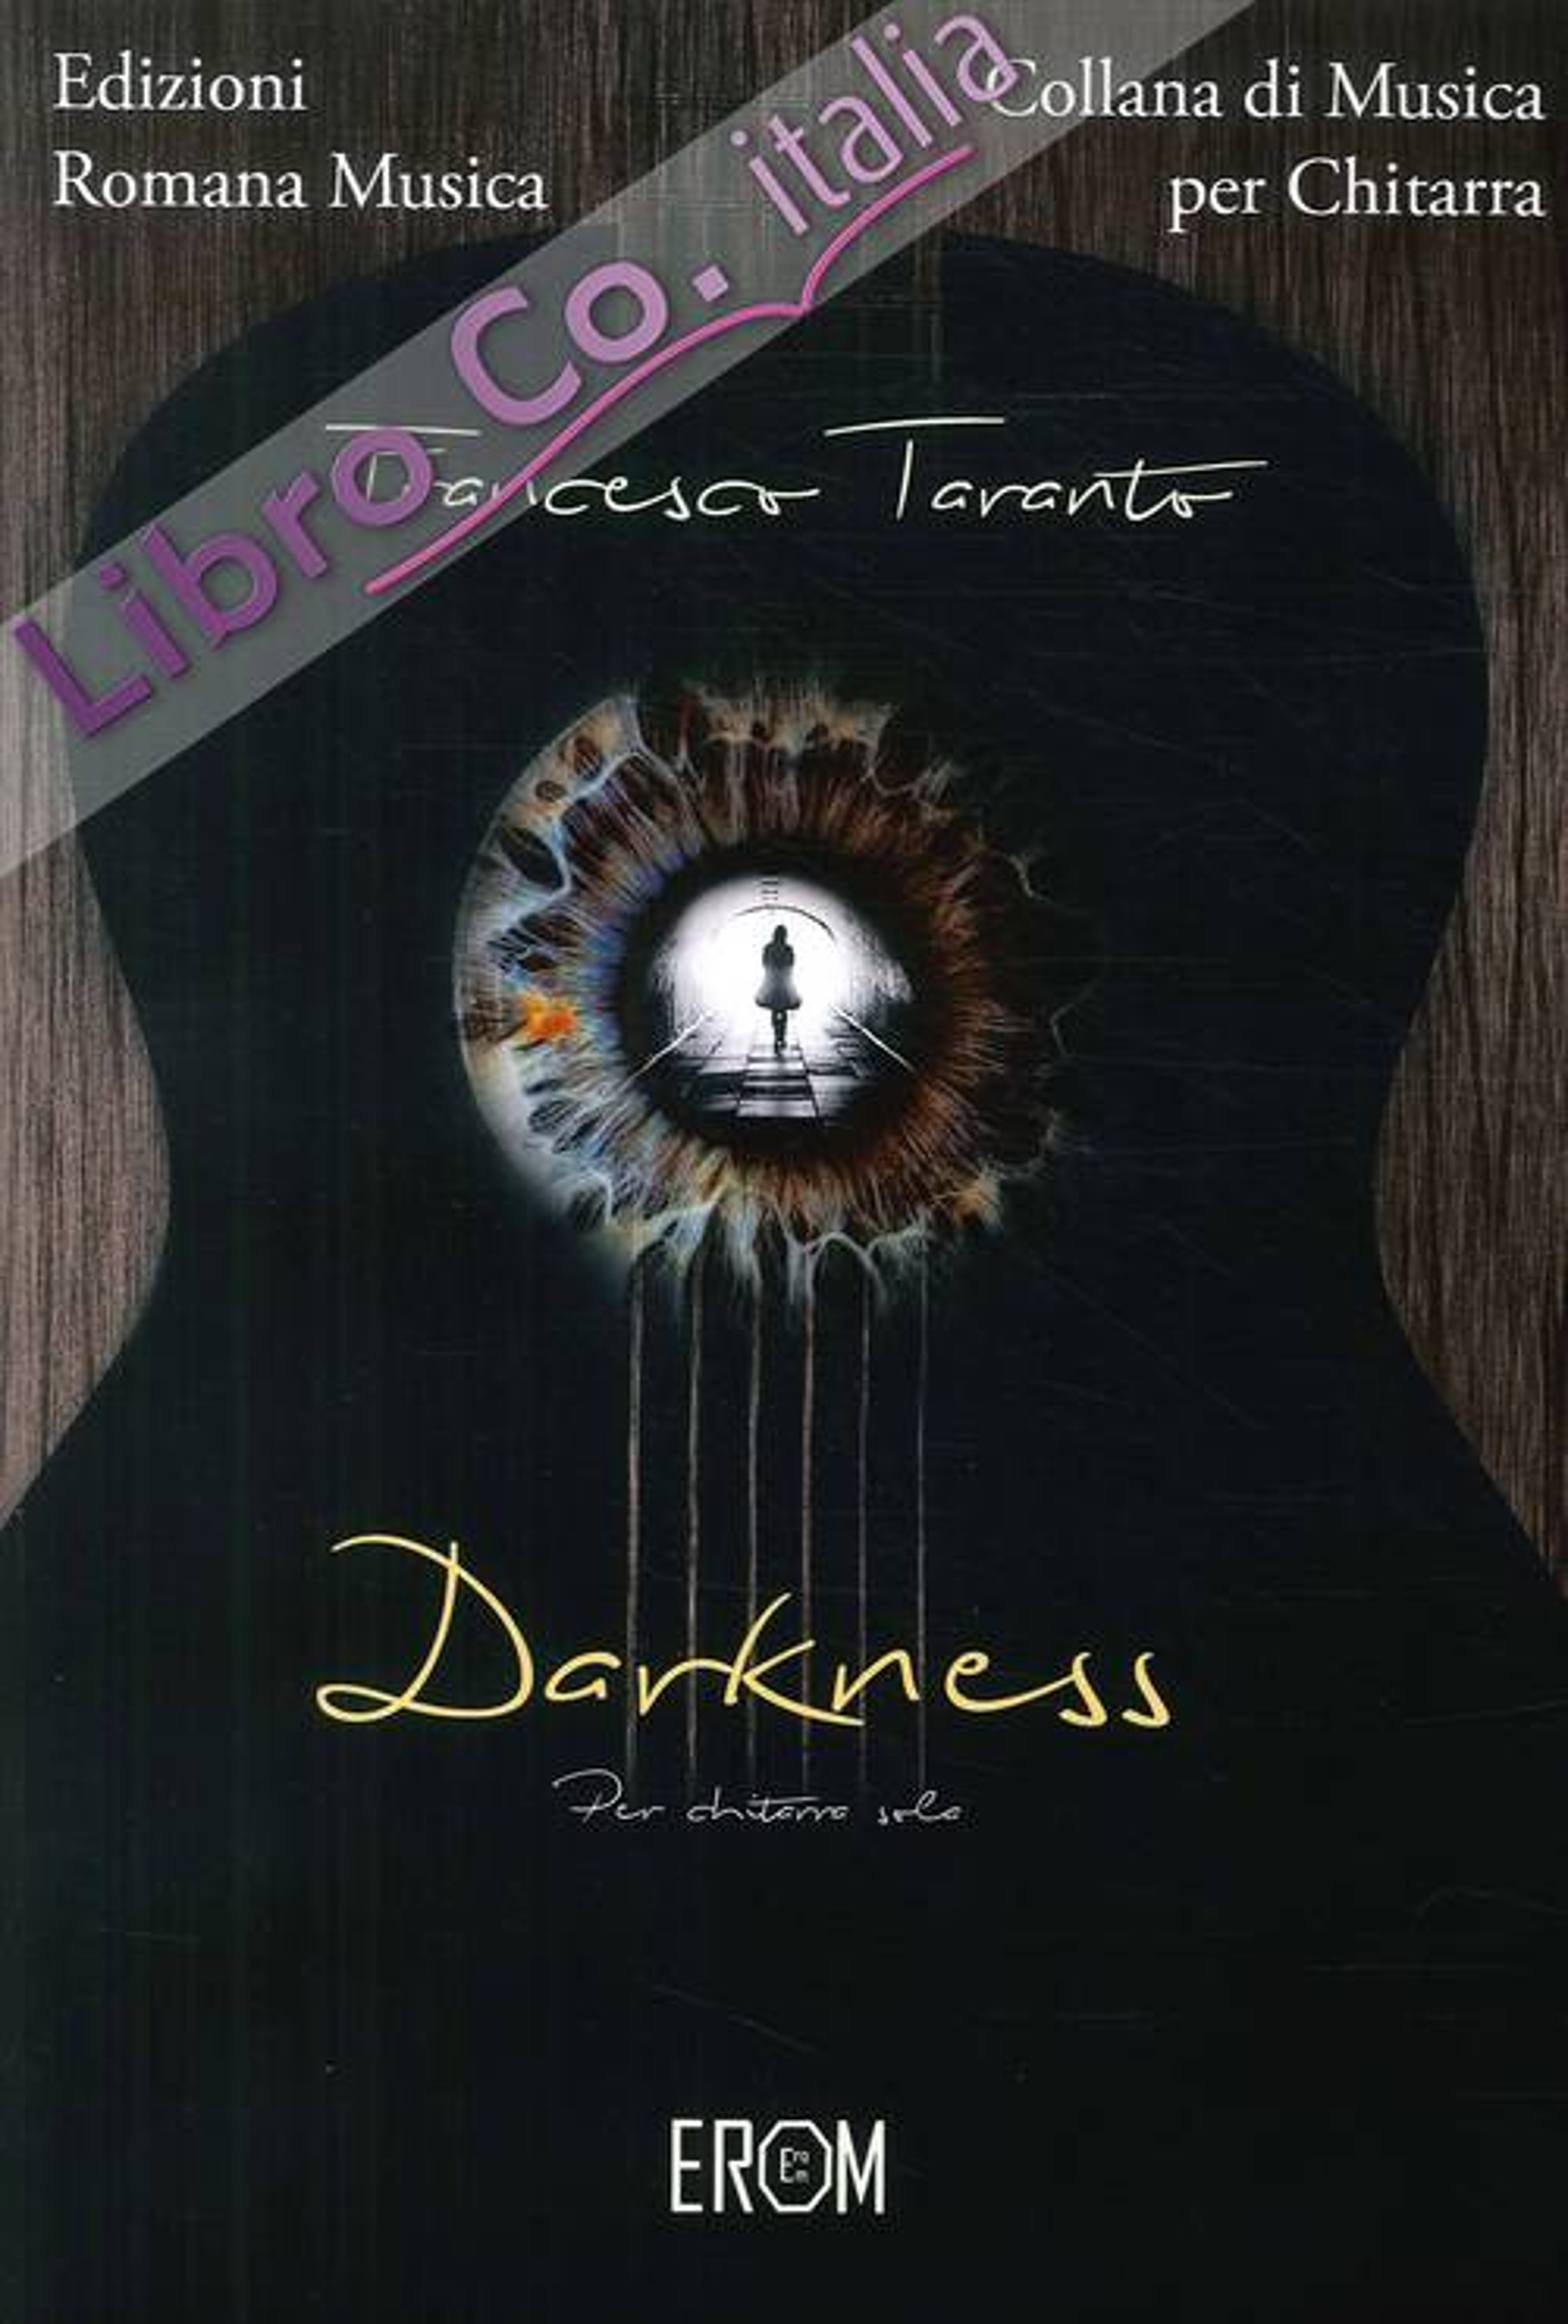 Francesco Taranto. Darkness. Musica per Chitarra. Erom 0222.